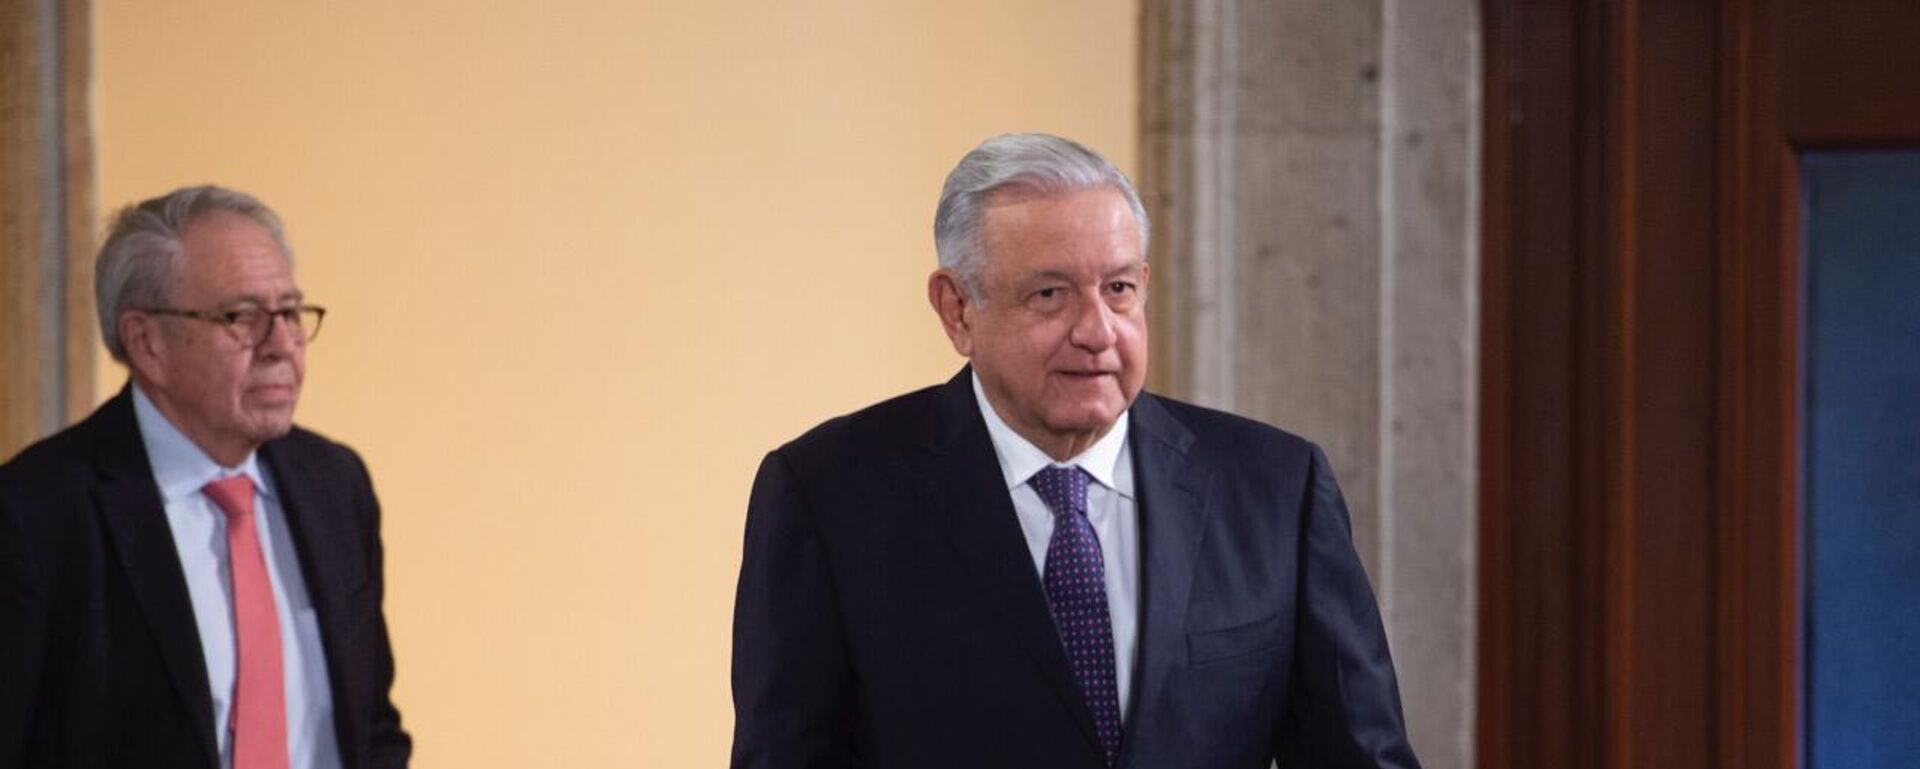 El presidente de México, Andrés Manuel López Obrador - Sputnik Mundo, 1920, 12.10.2021